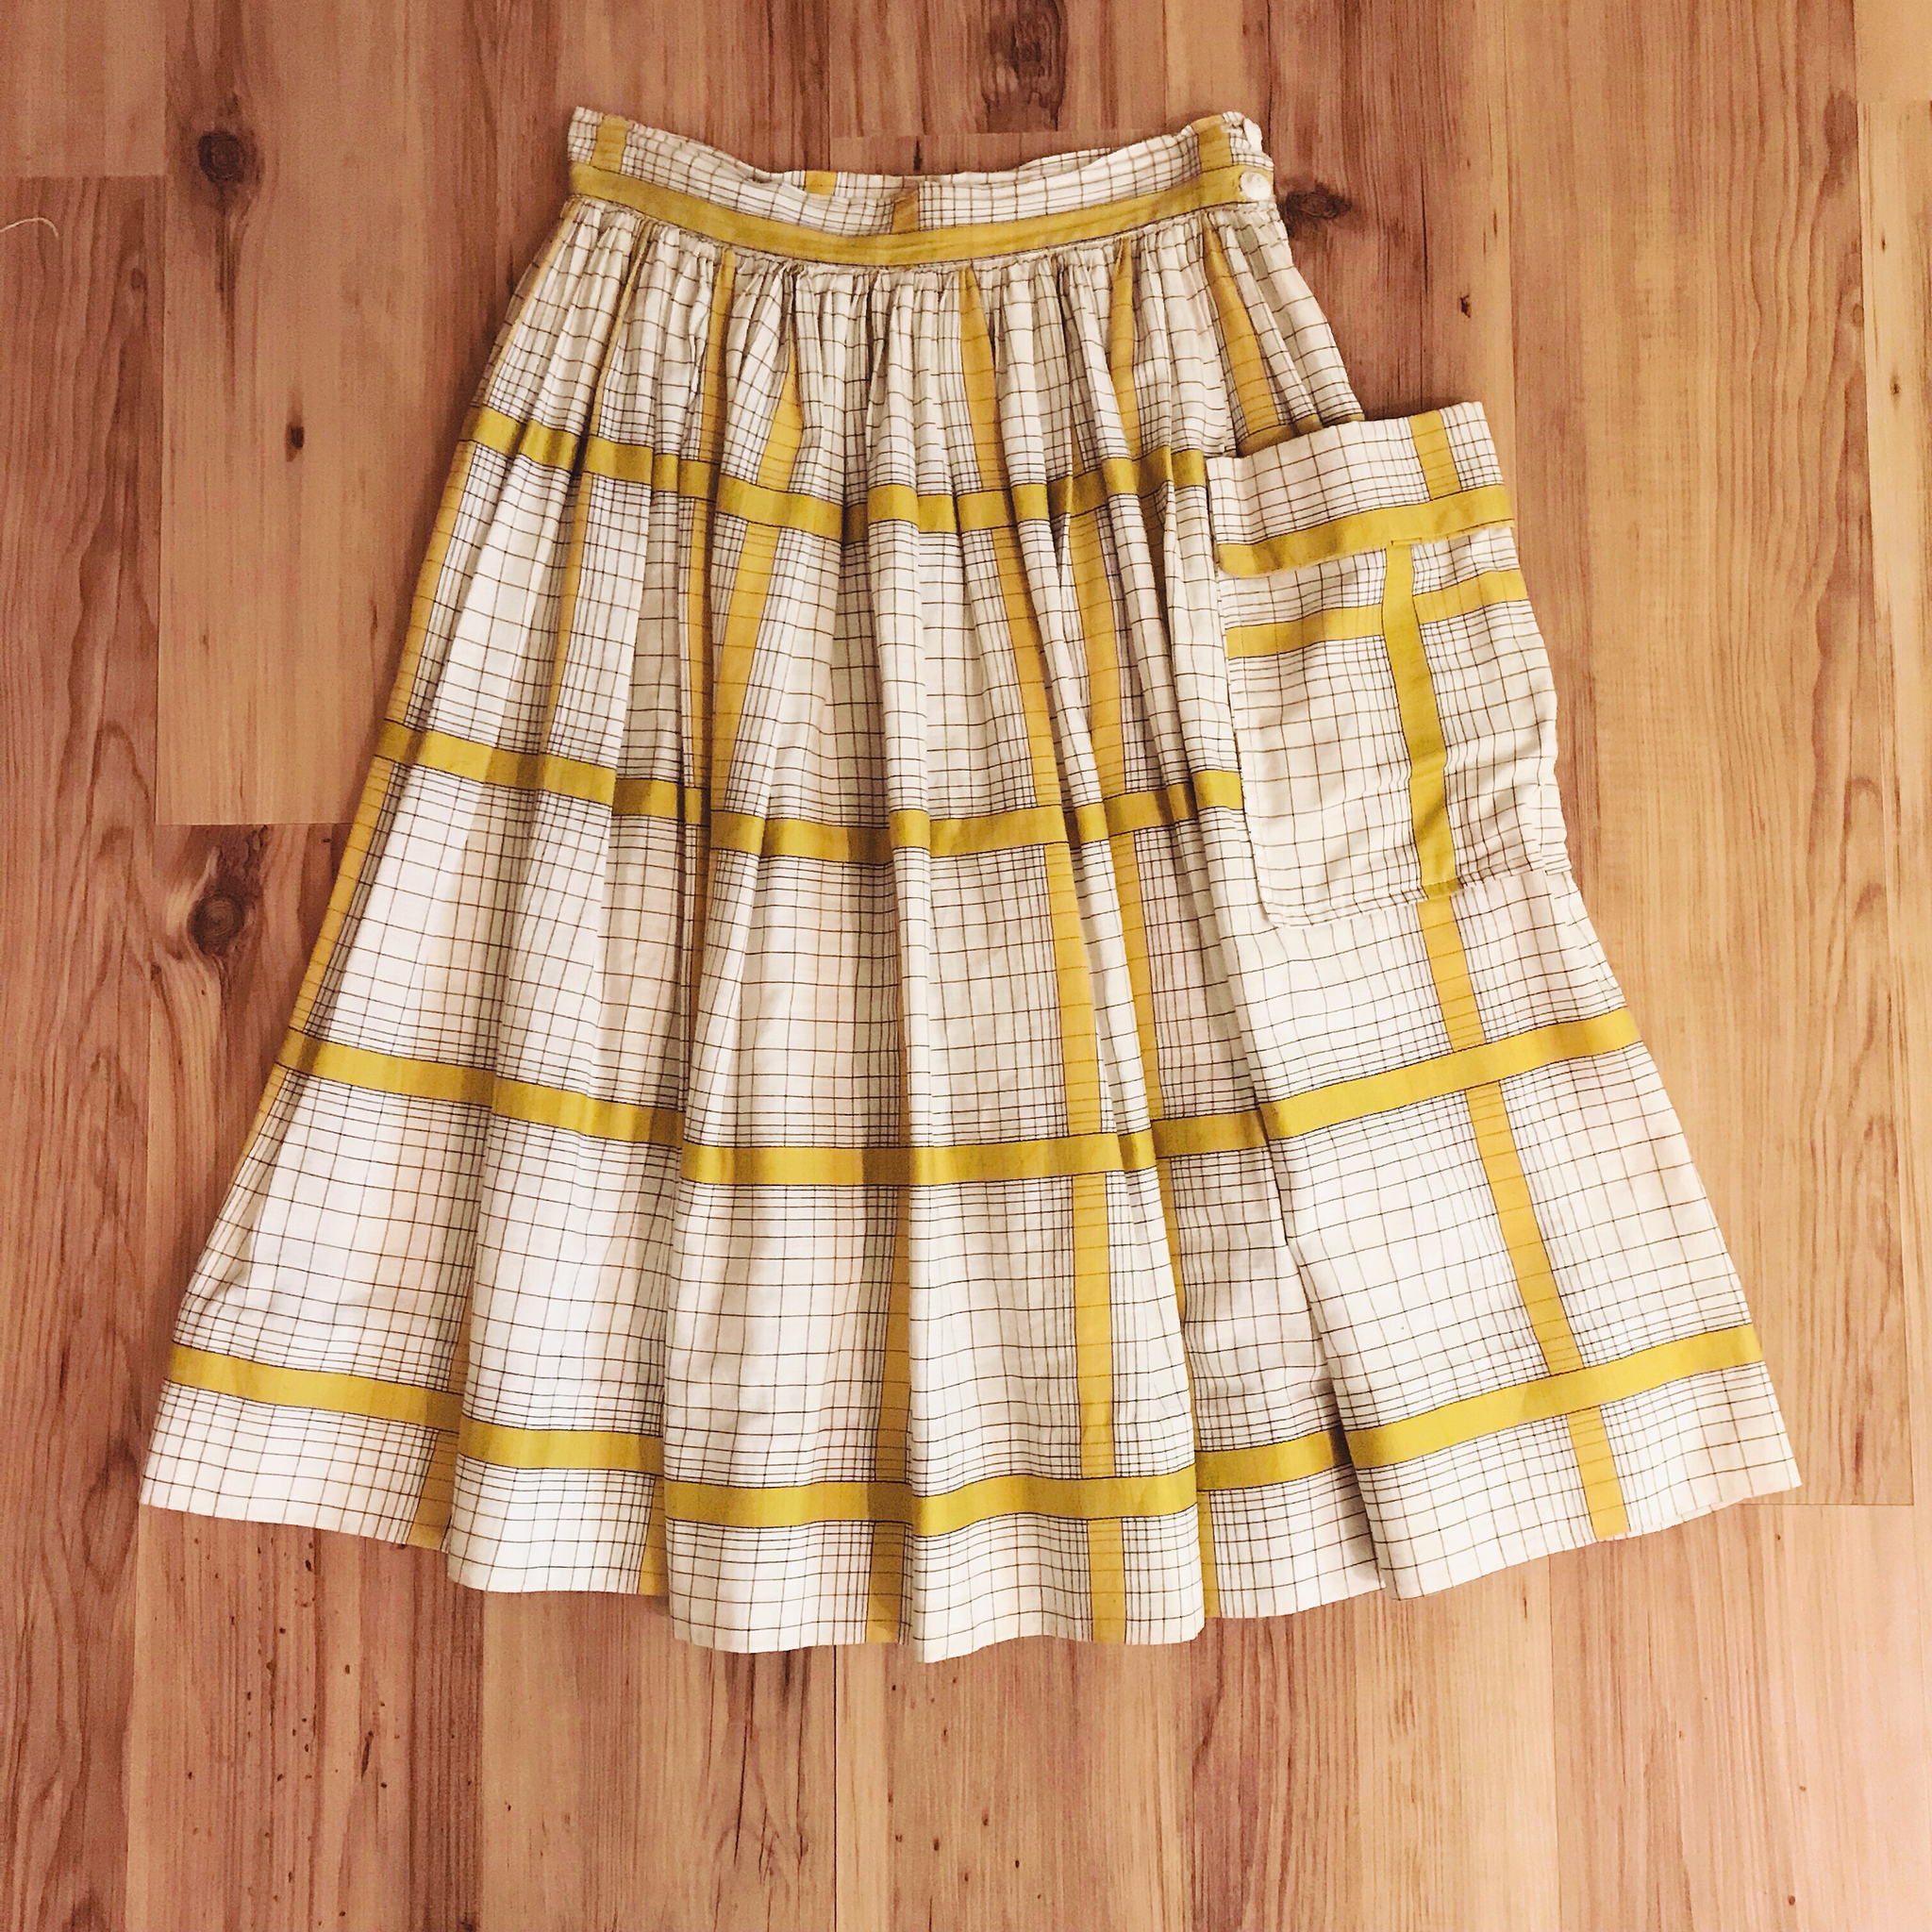 1950s One-Pocket Plaid Skirt